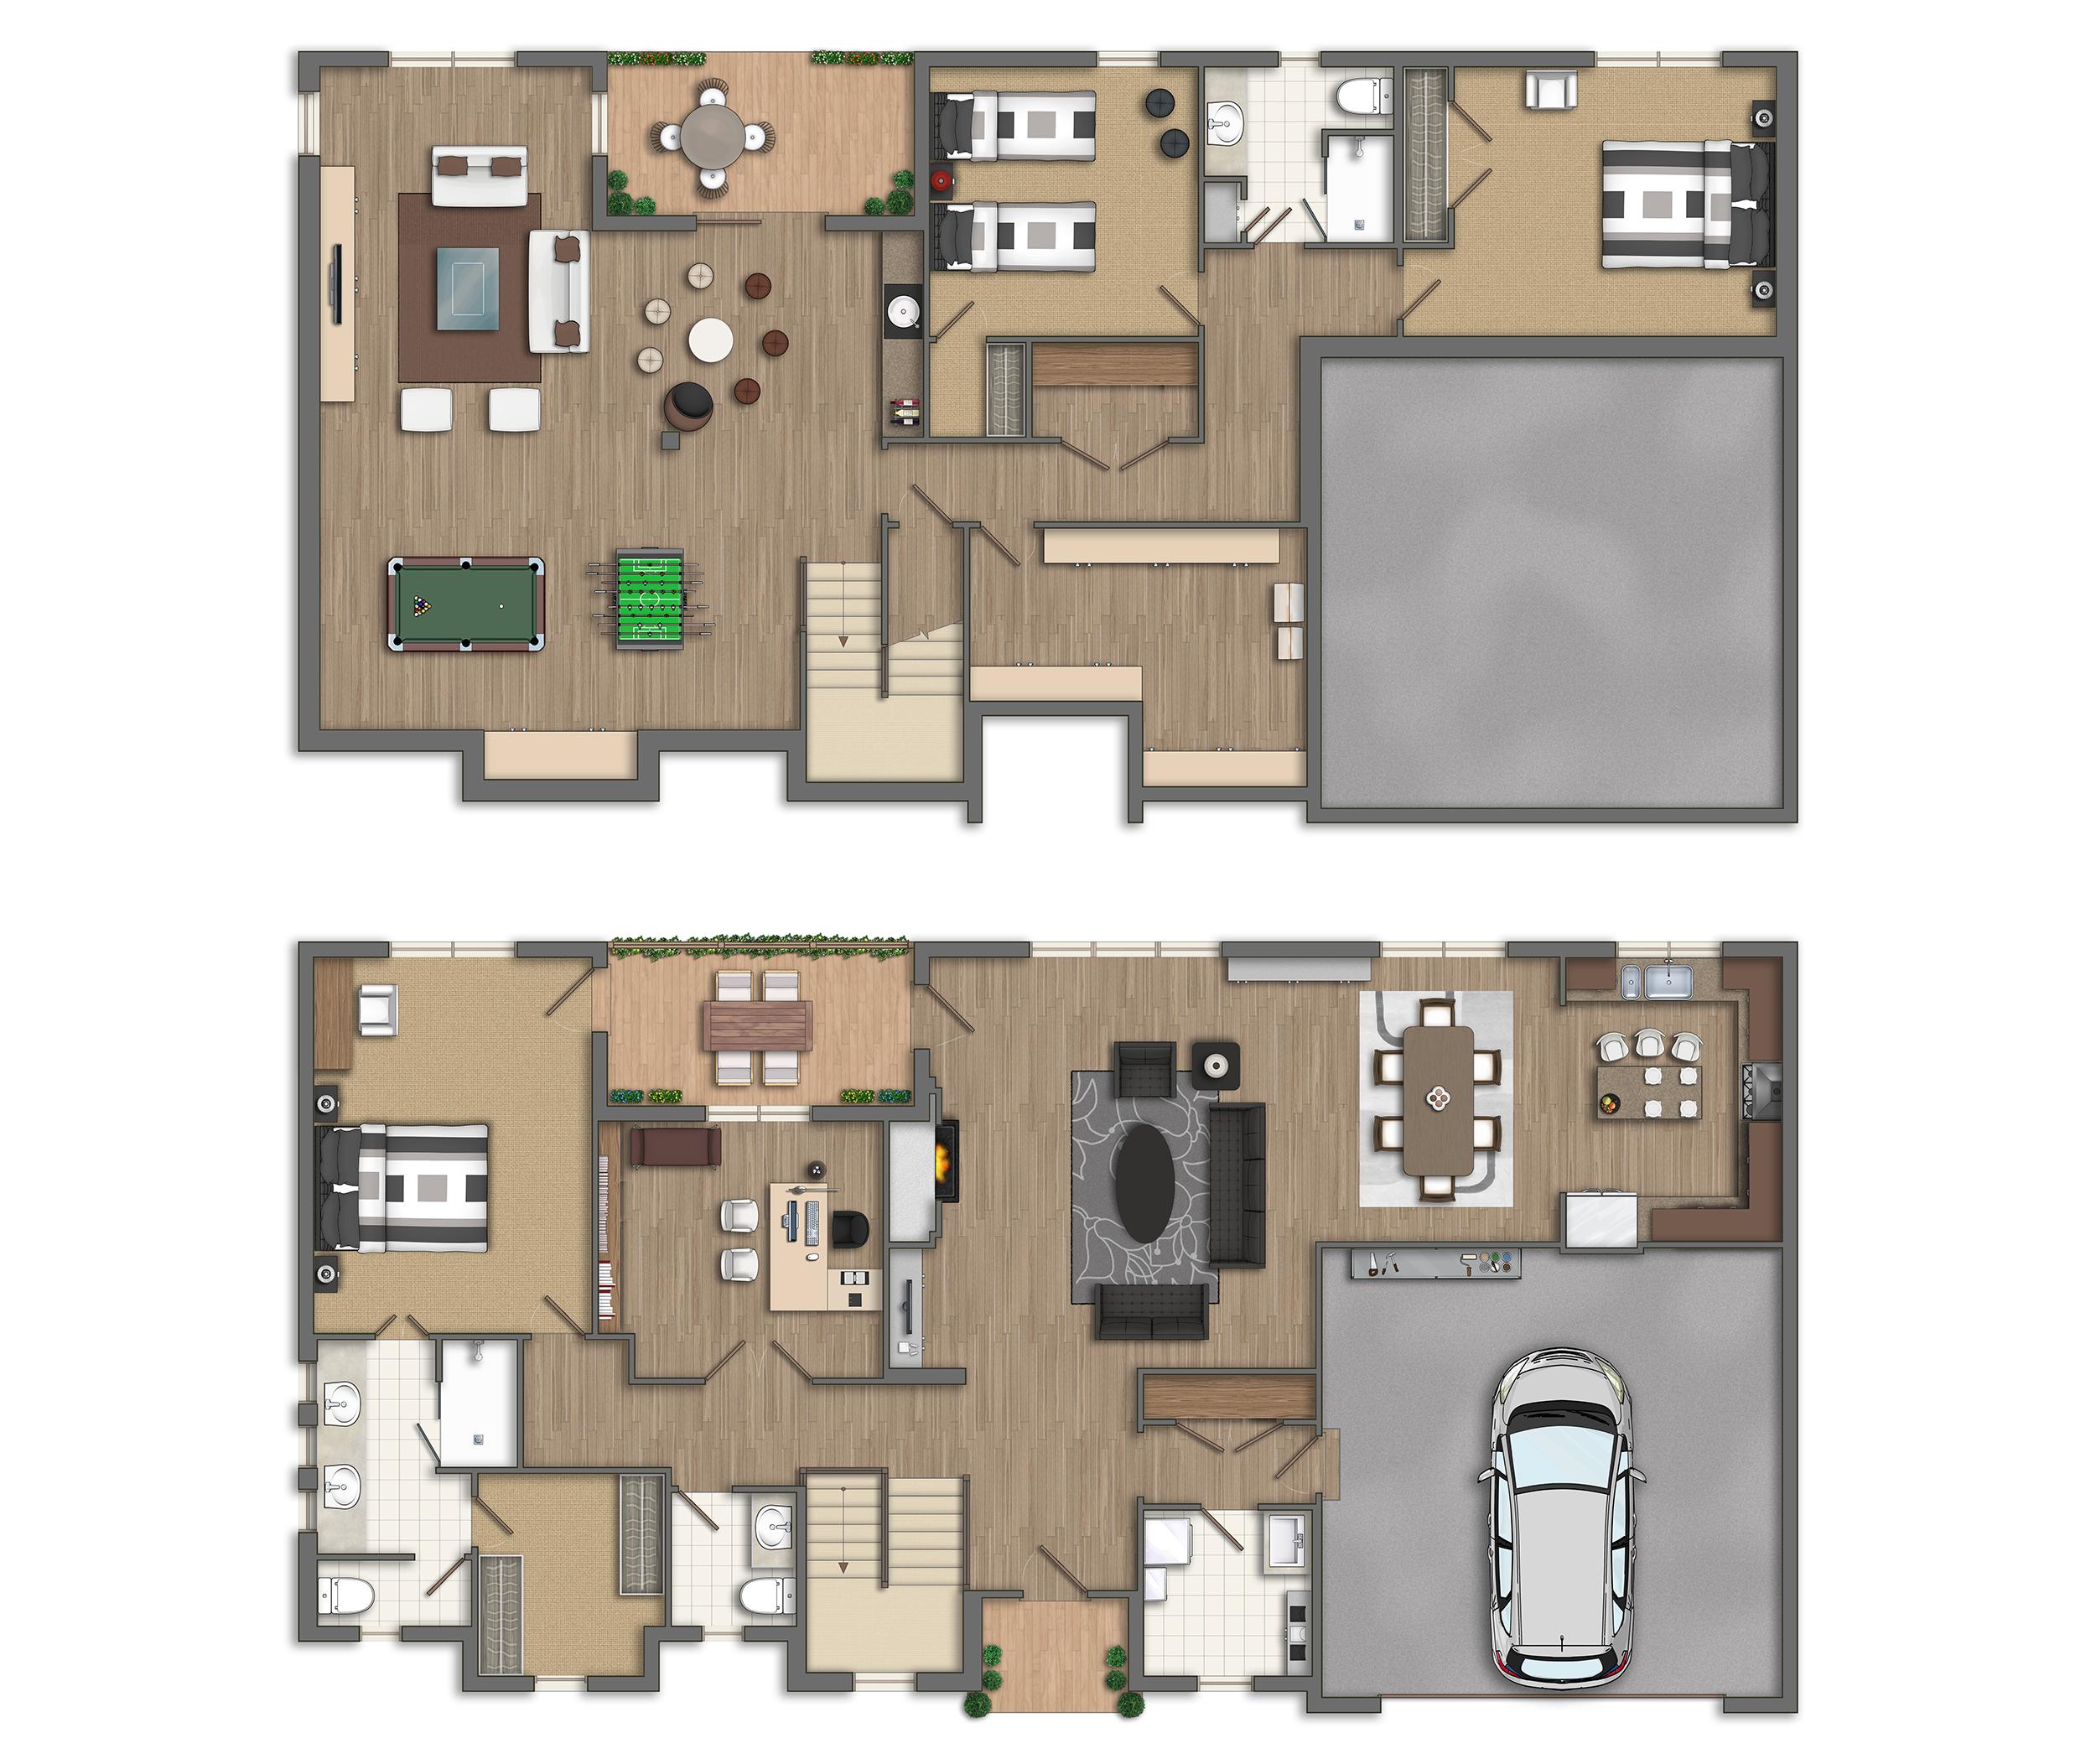 Photoshop planos 2d casas americanas - Como hacer planos de casas en 3d ...